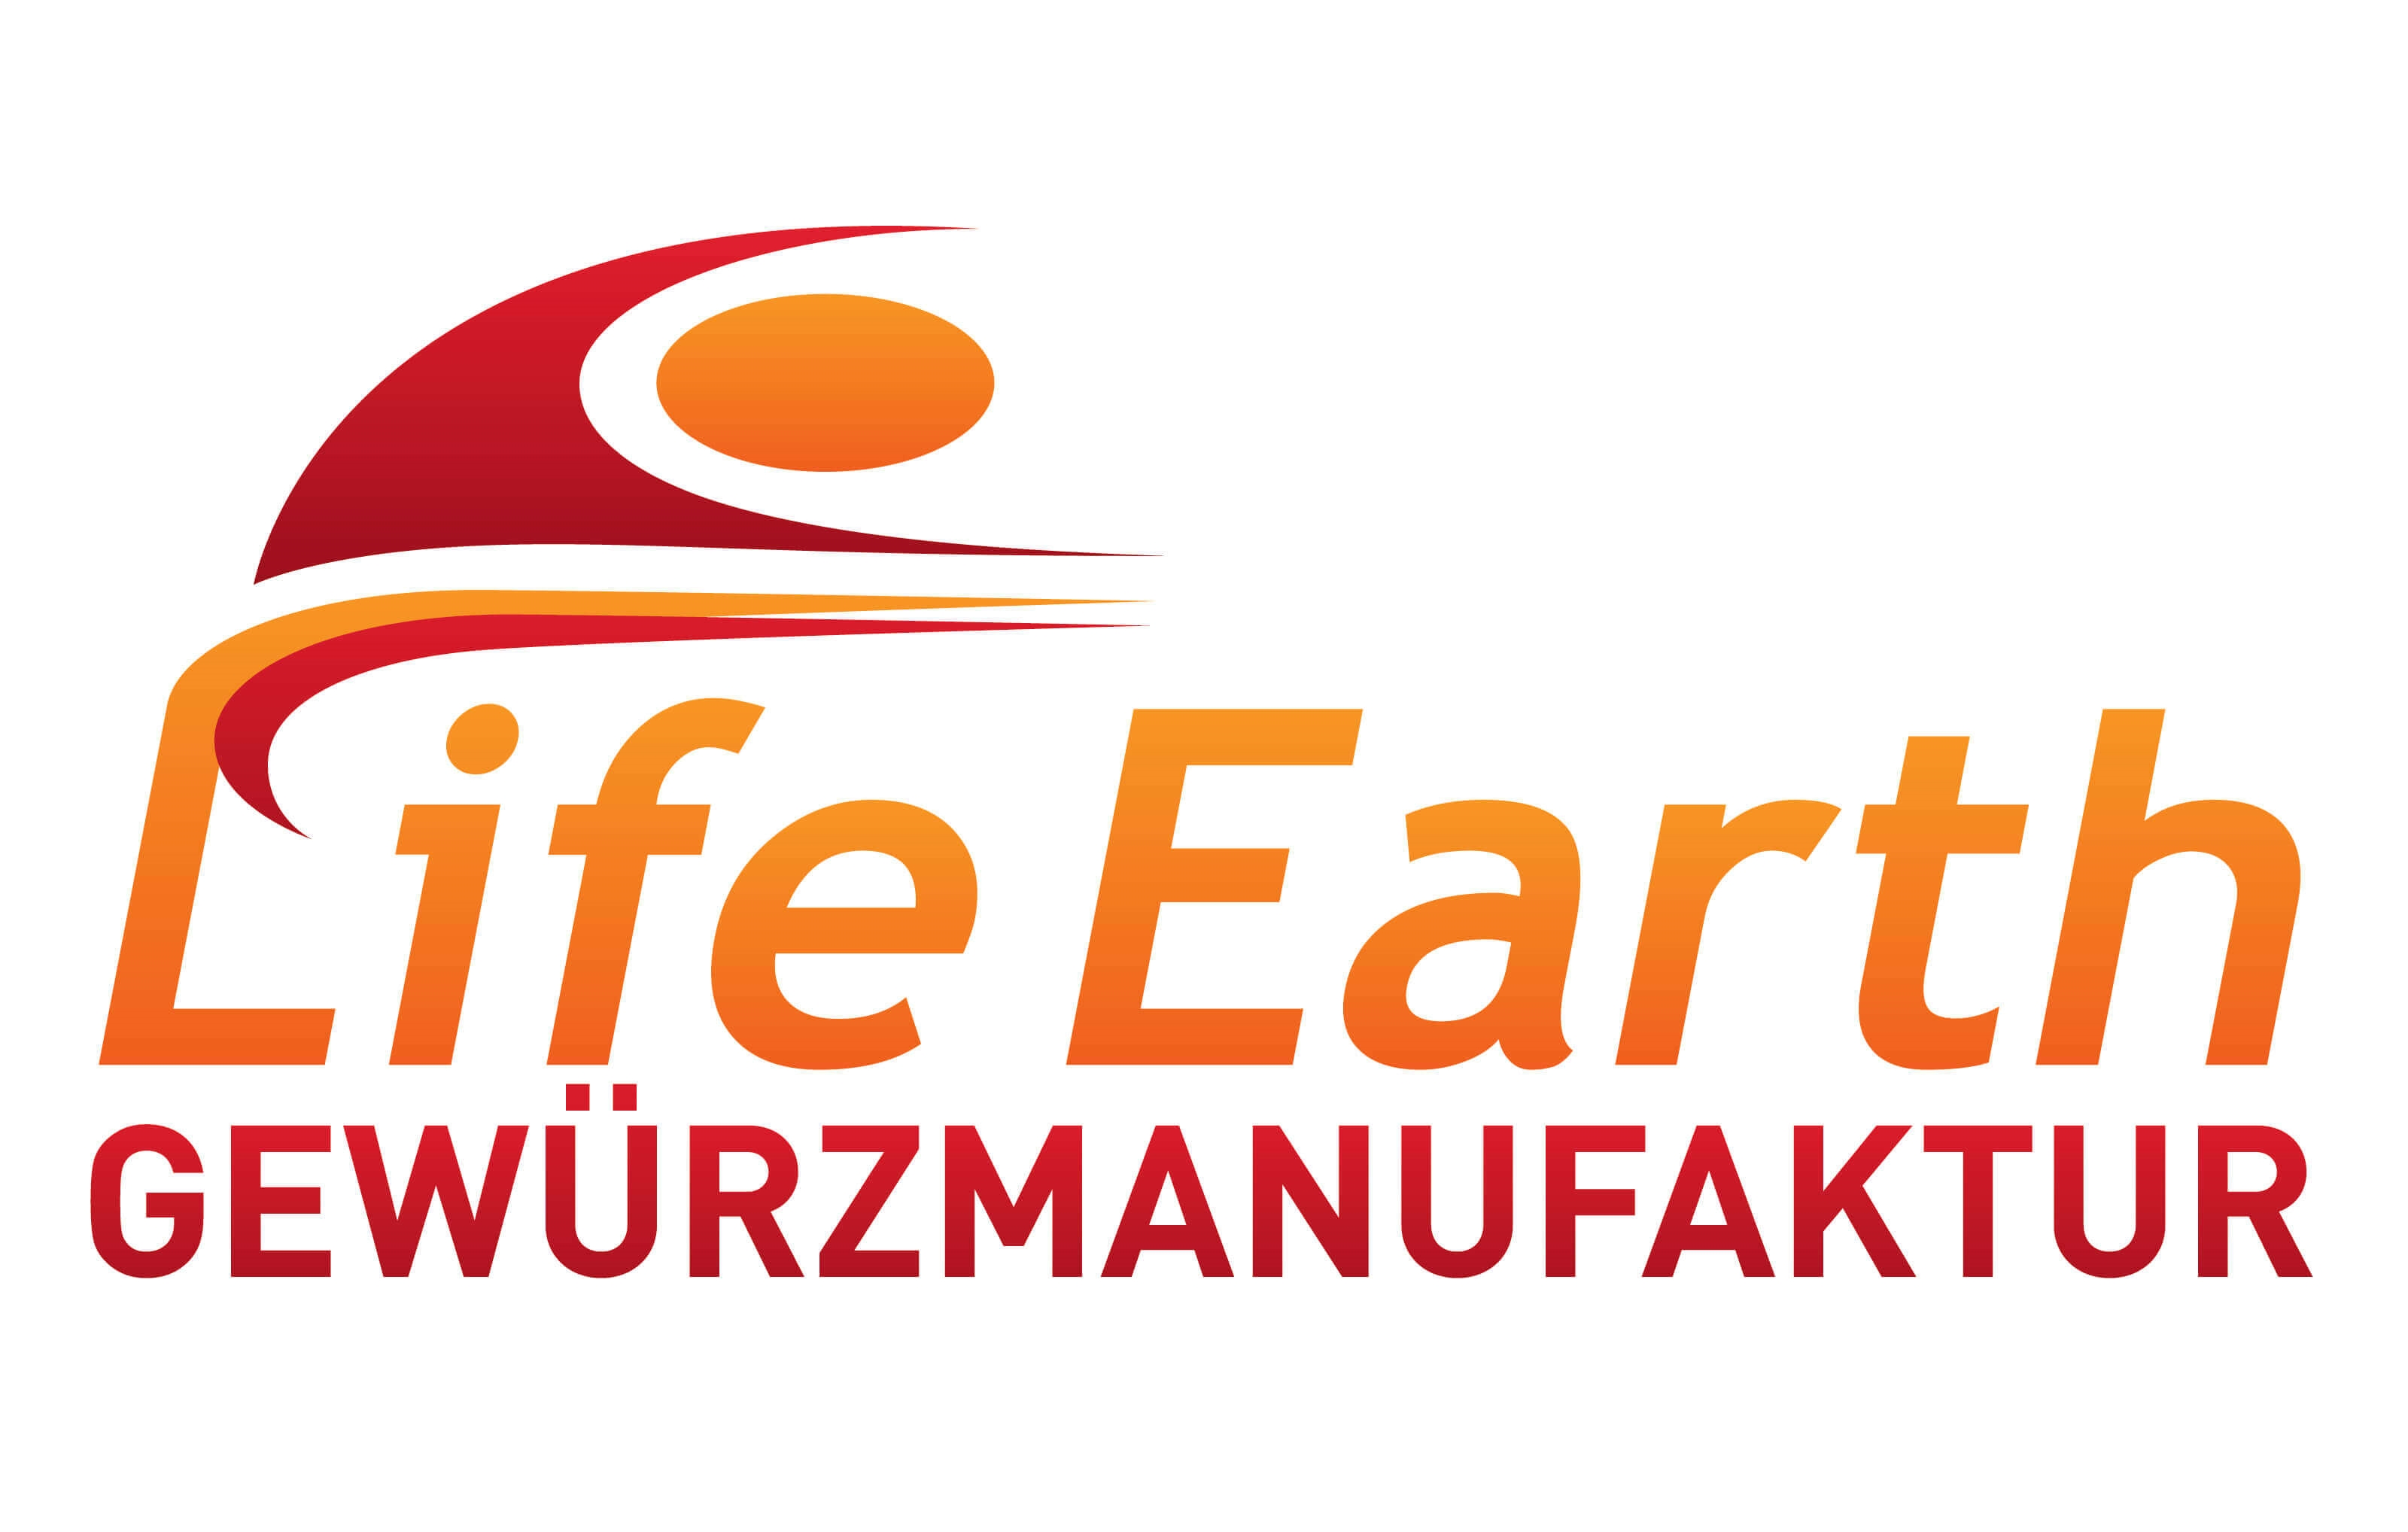 Gewürzmanufaktur Life Earth Logo